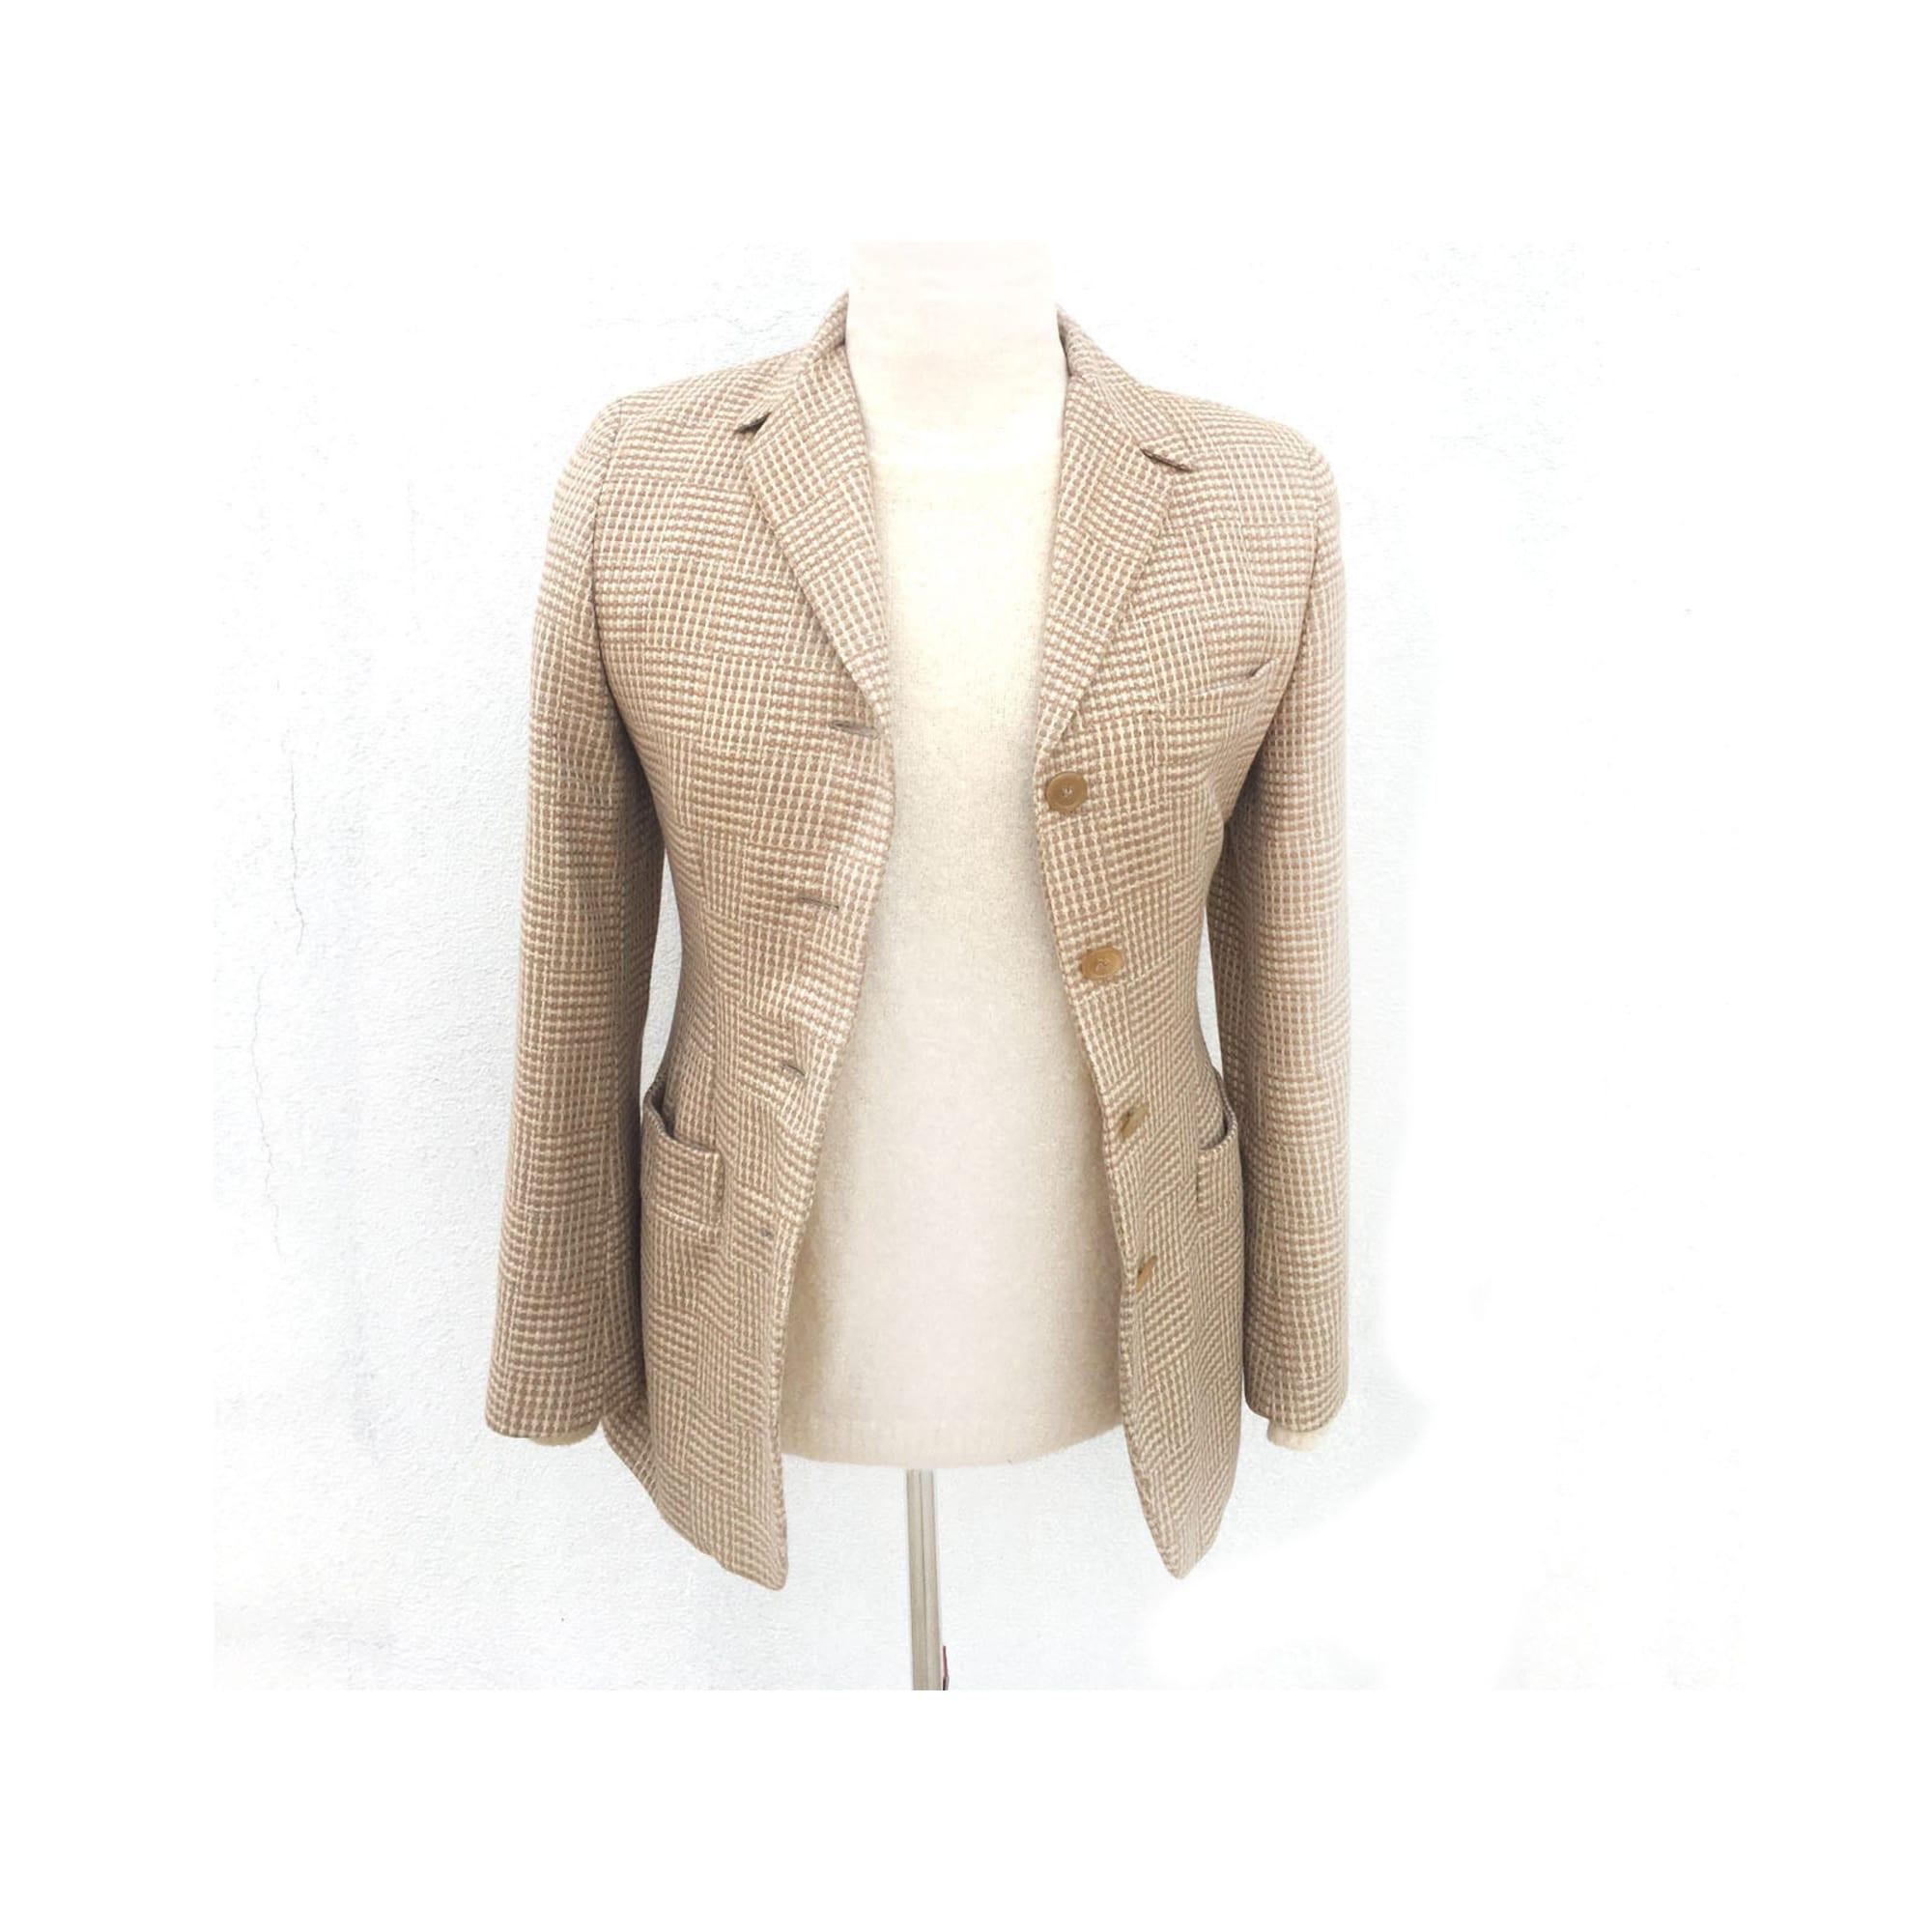 Blazer, veste tailleur ANTONIO FUSCO Beige, camel